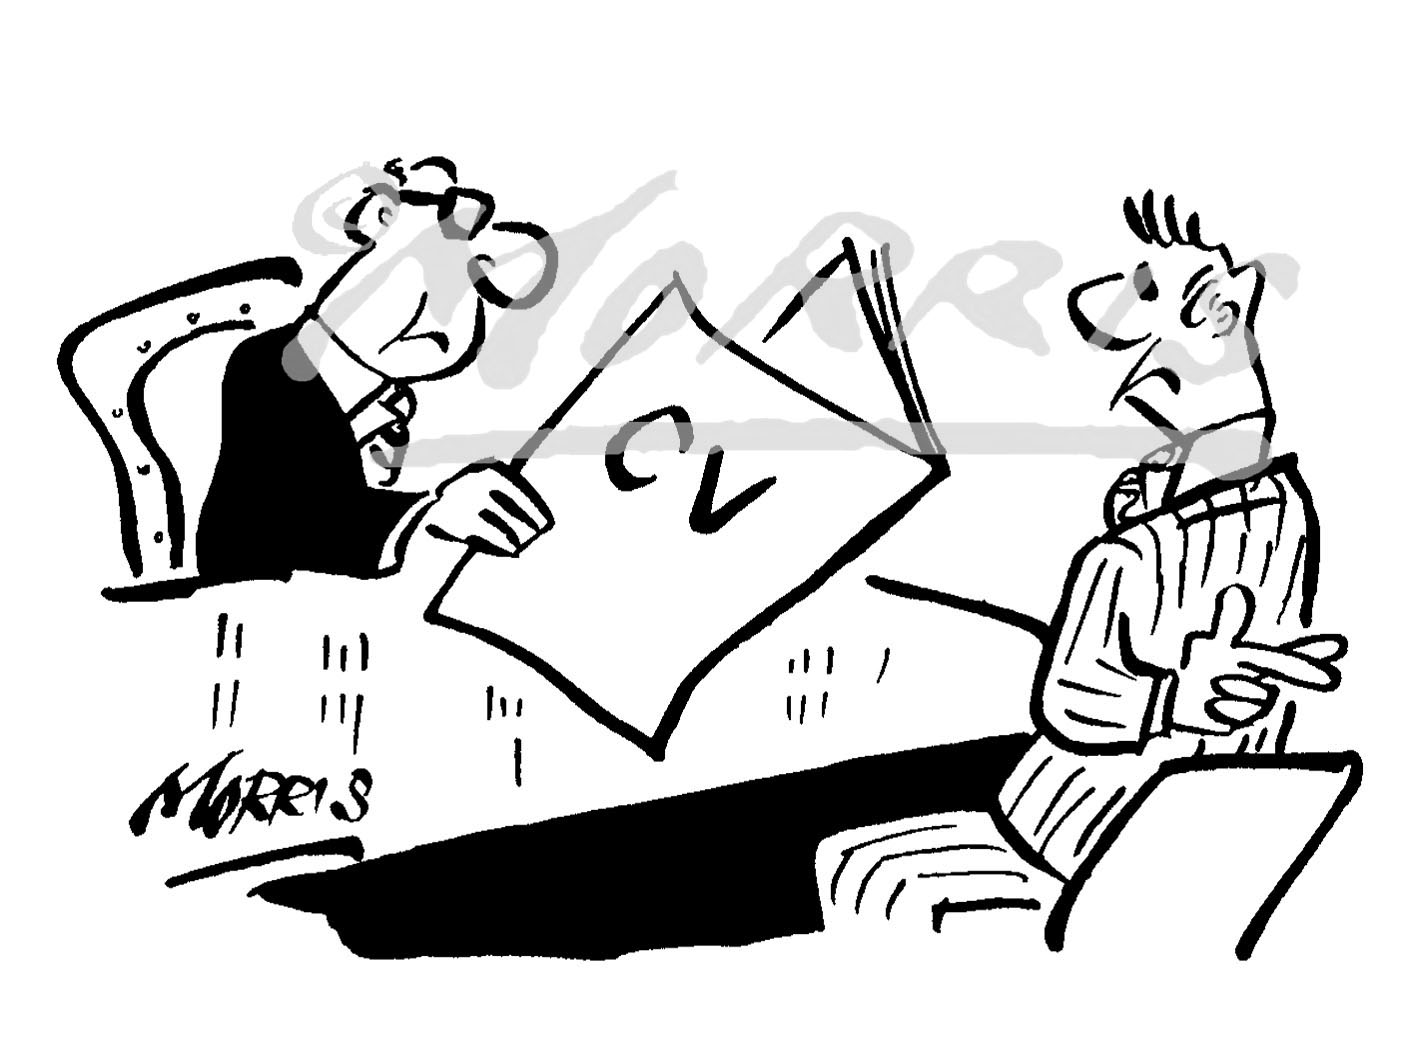 HR business comic cartoon – Ref: 2547bw